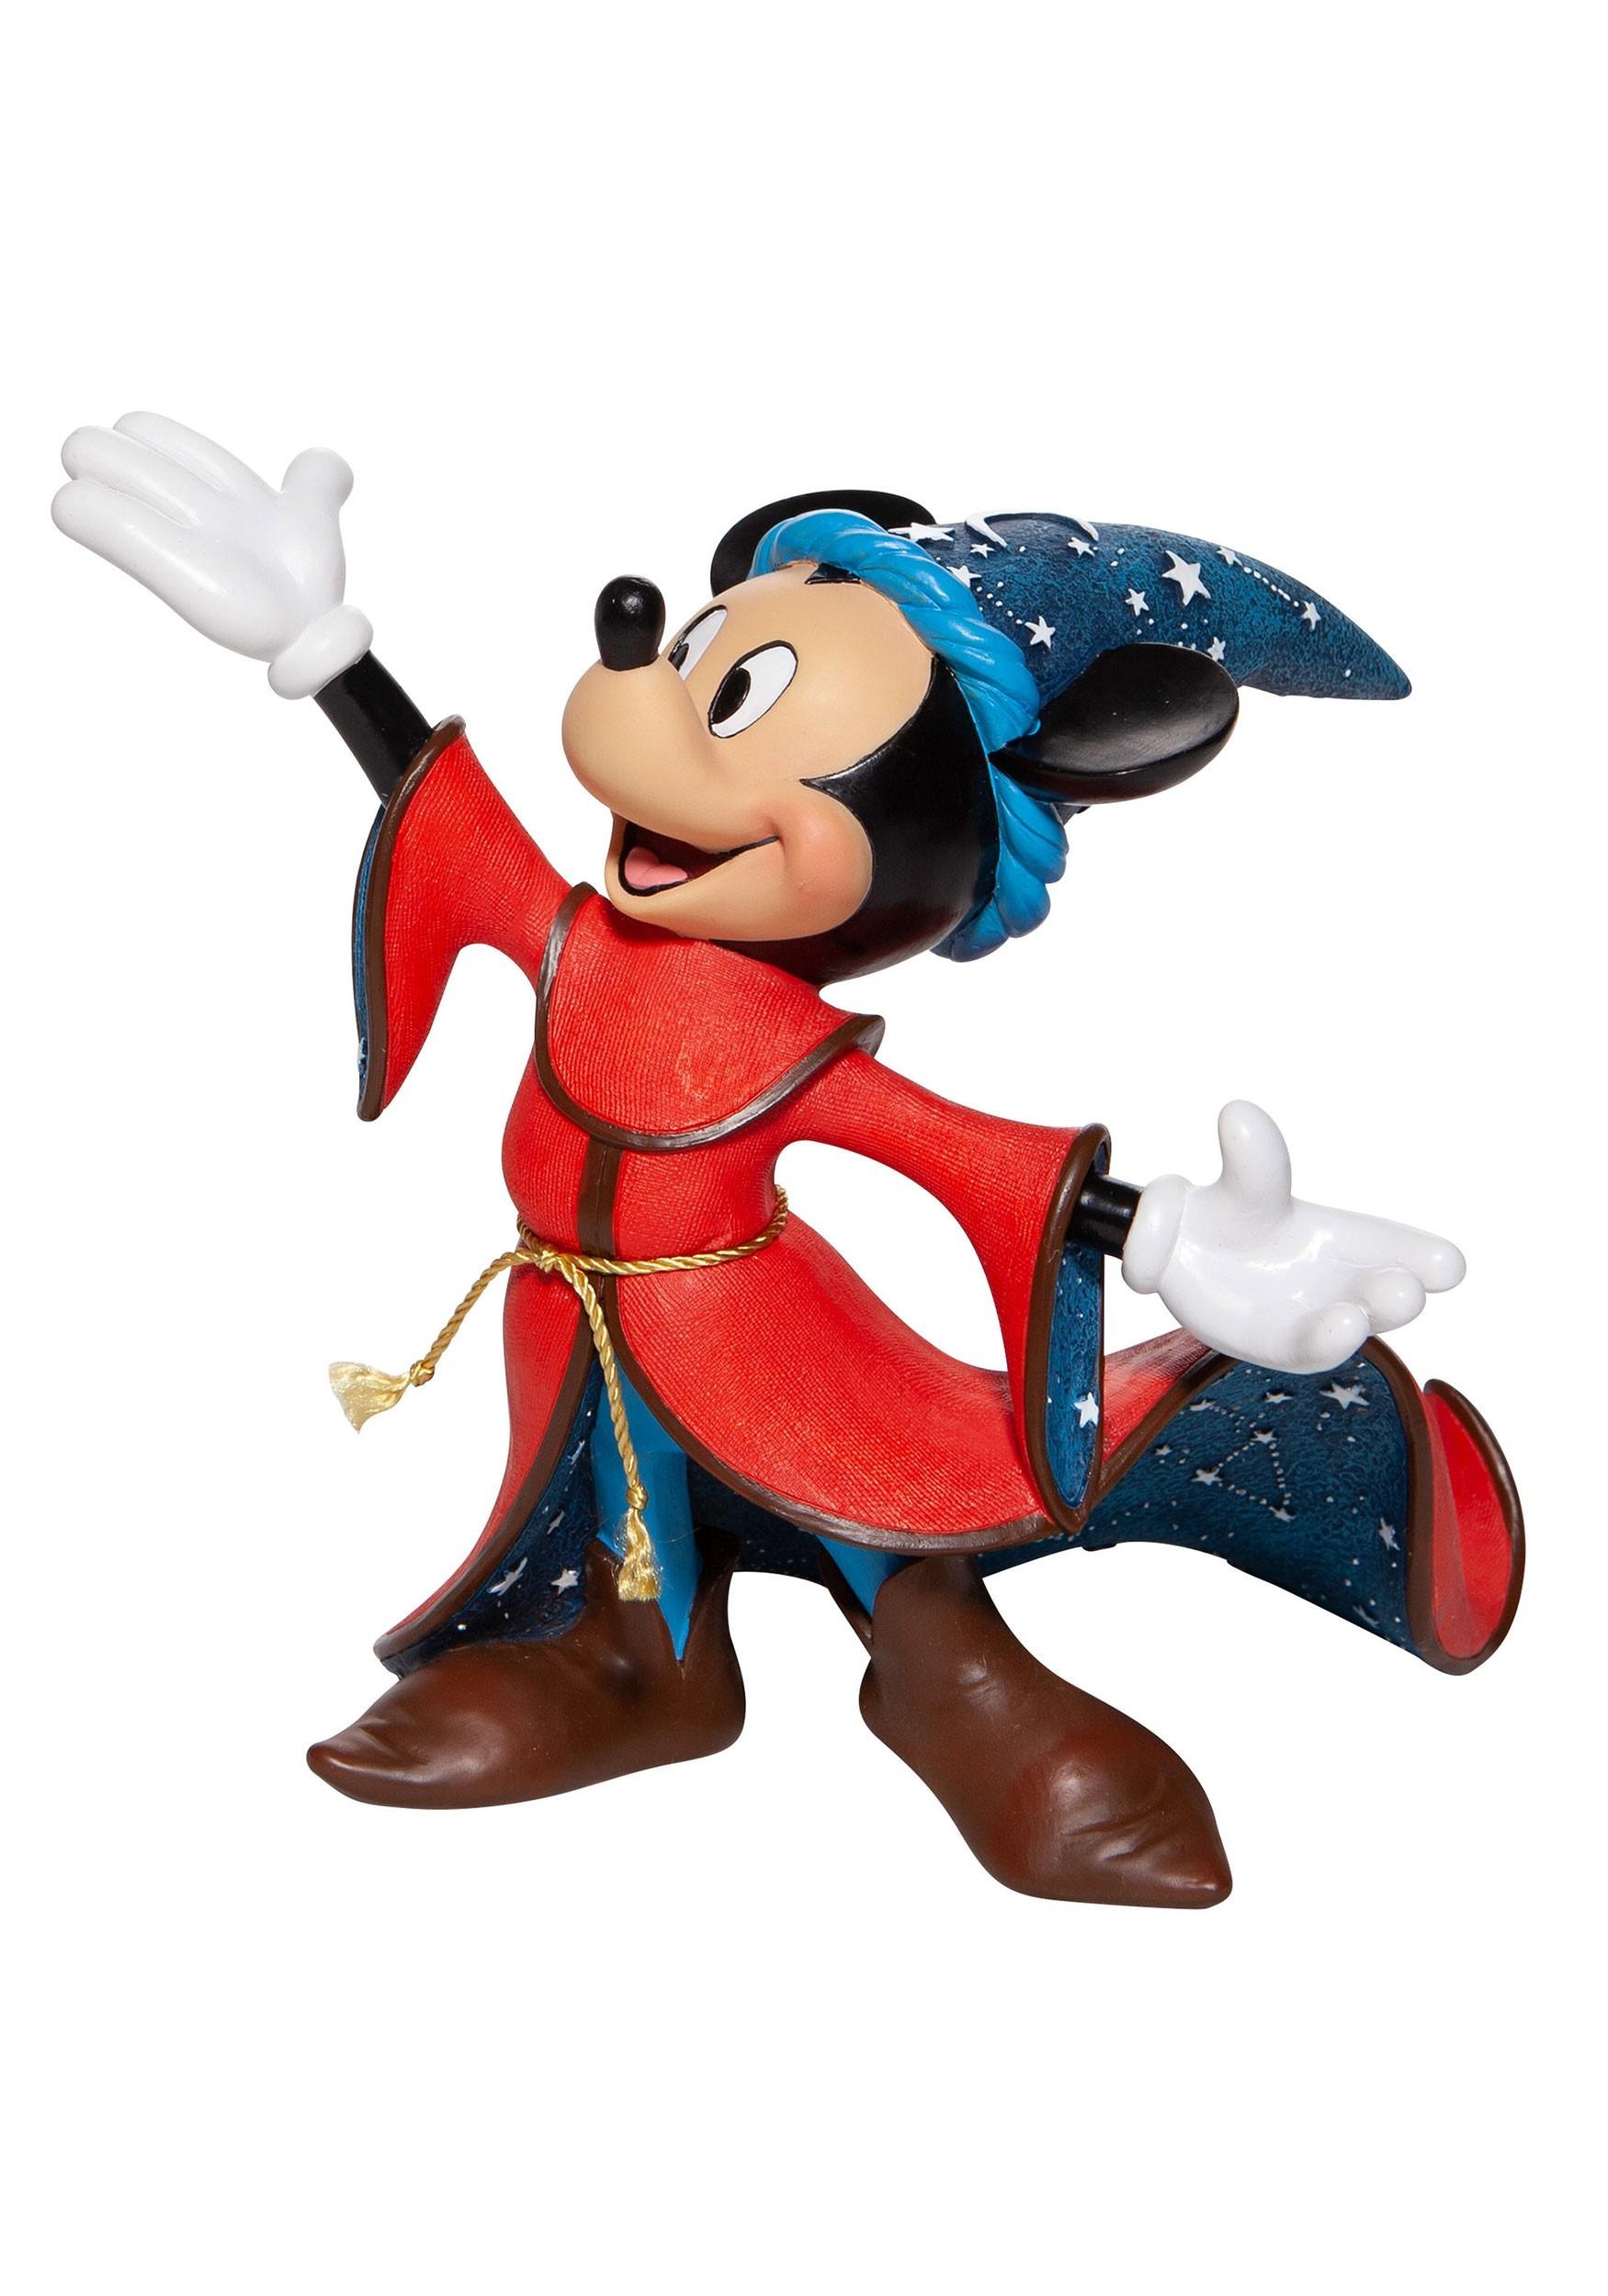 80th Anniversary Sorcerer Mickey Statue